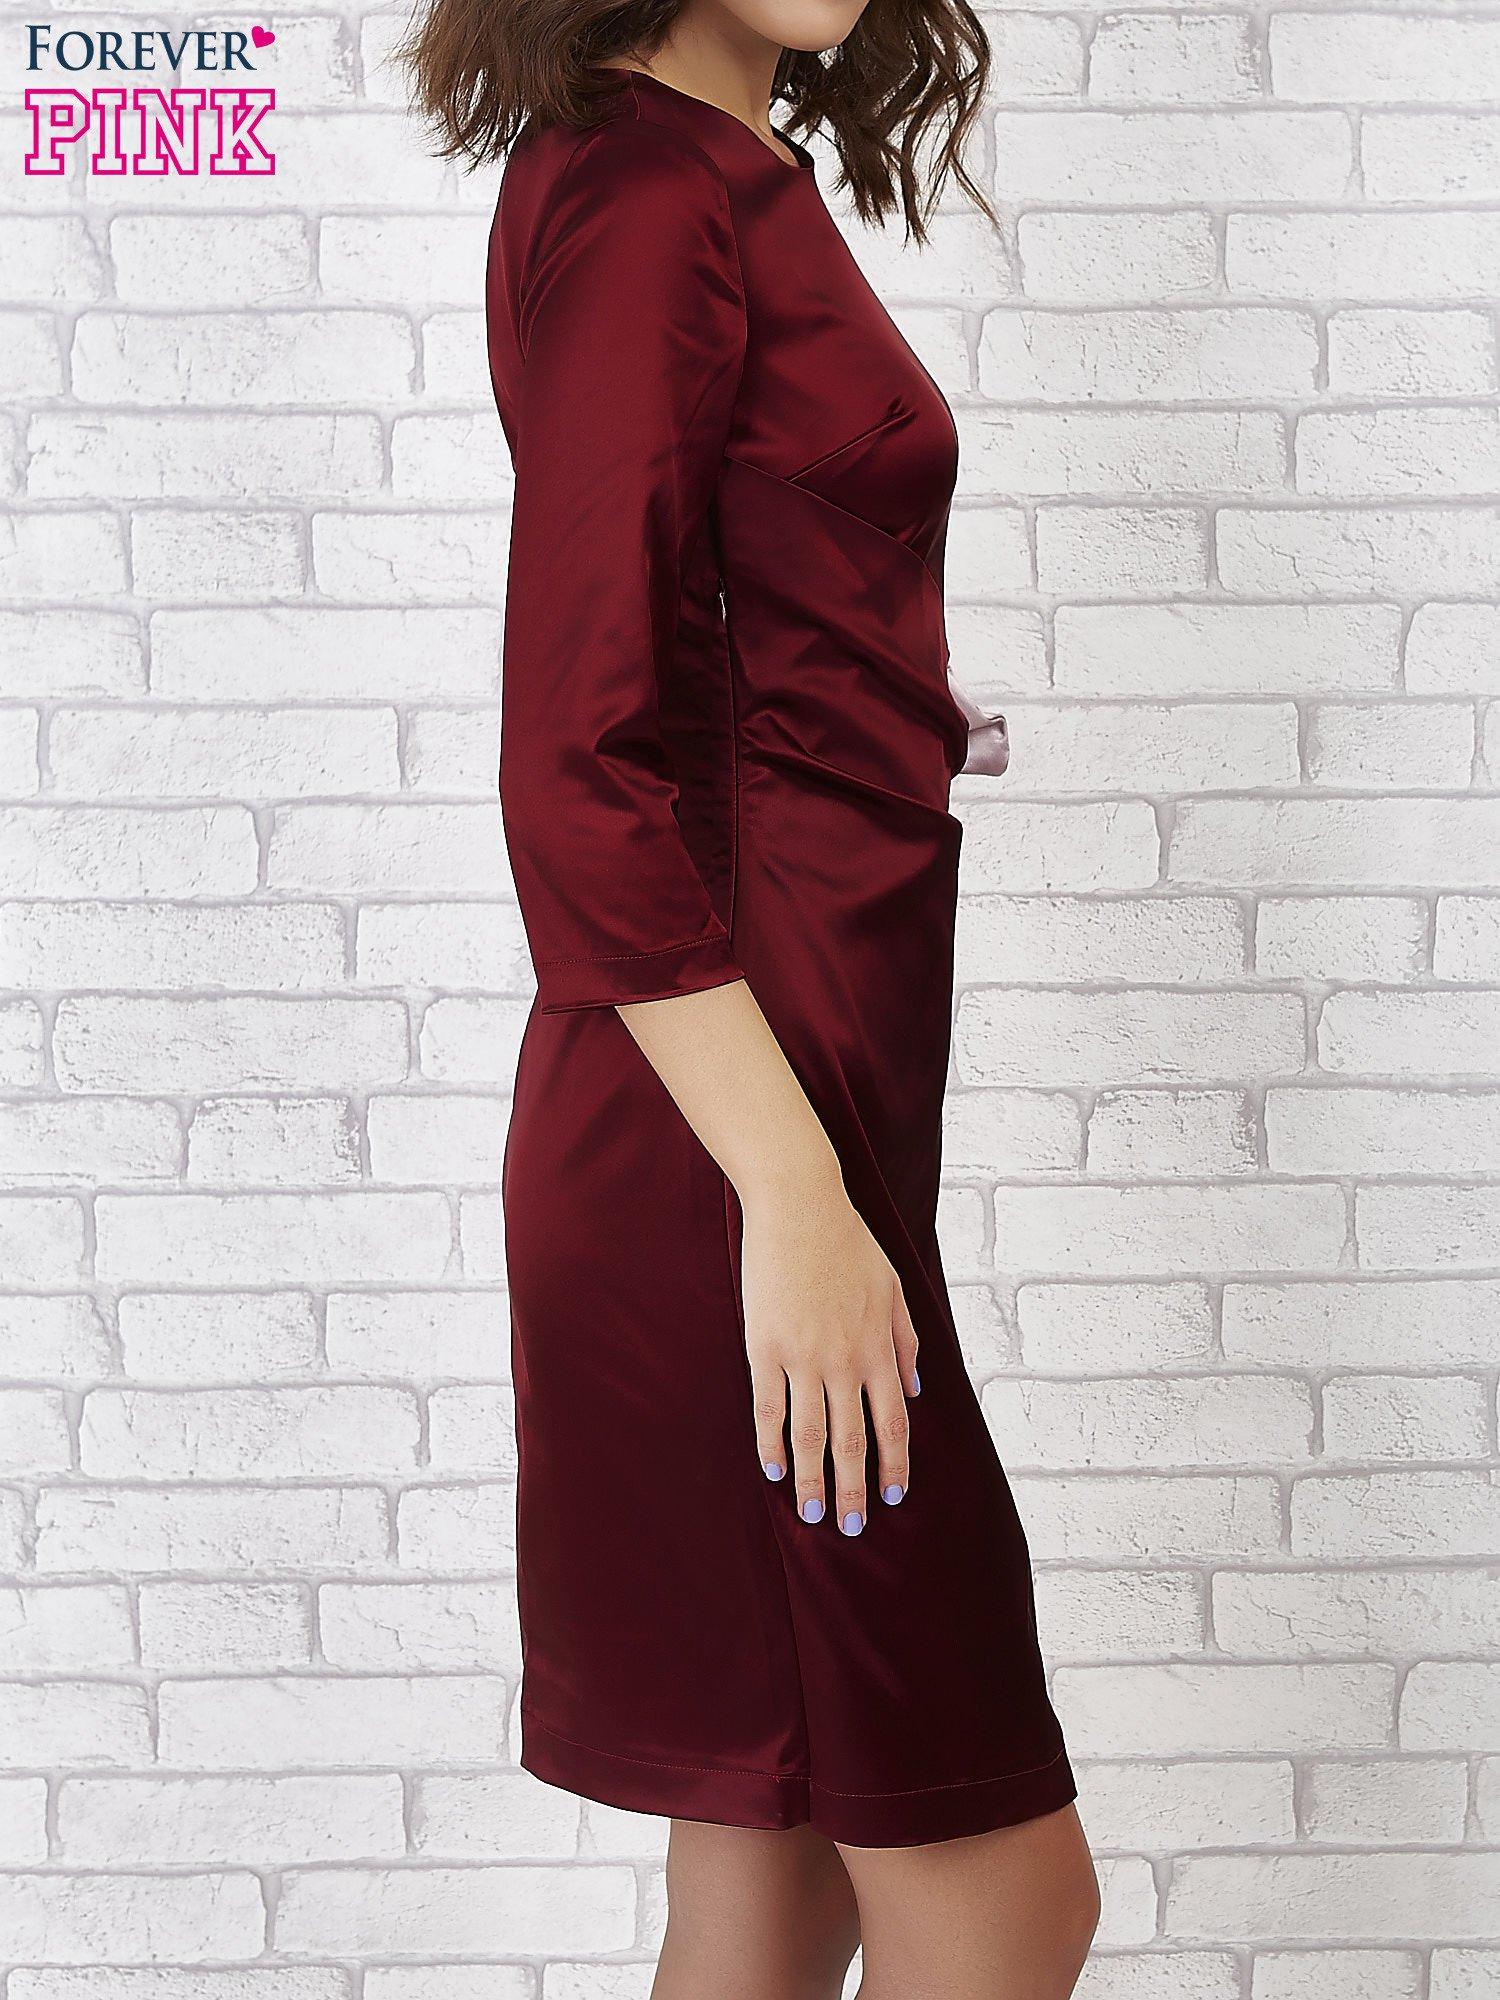 Bordowa sukienka ze srebrną kokardą                                   zdj.                                  2